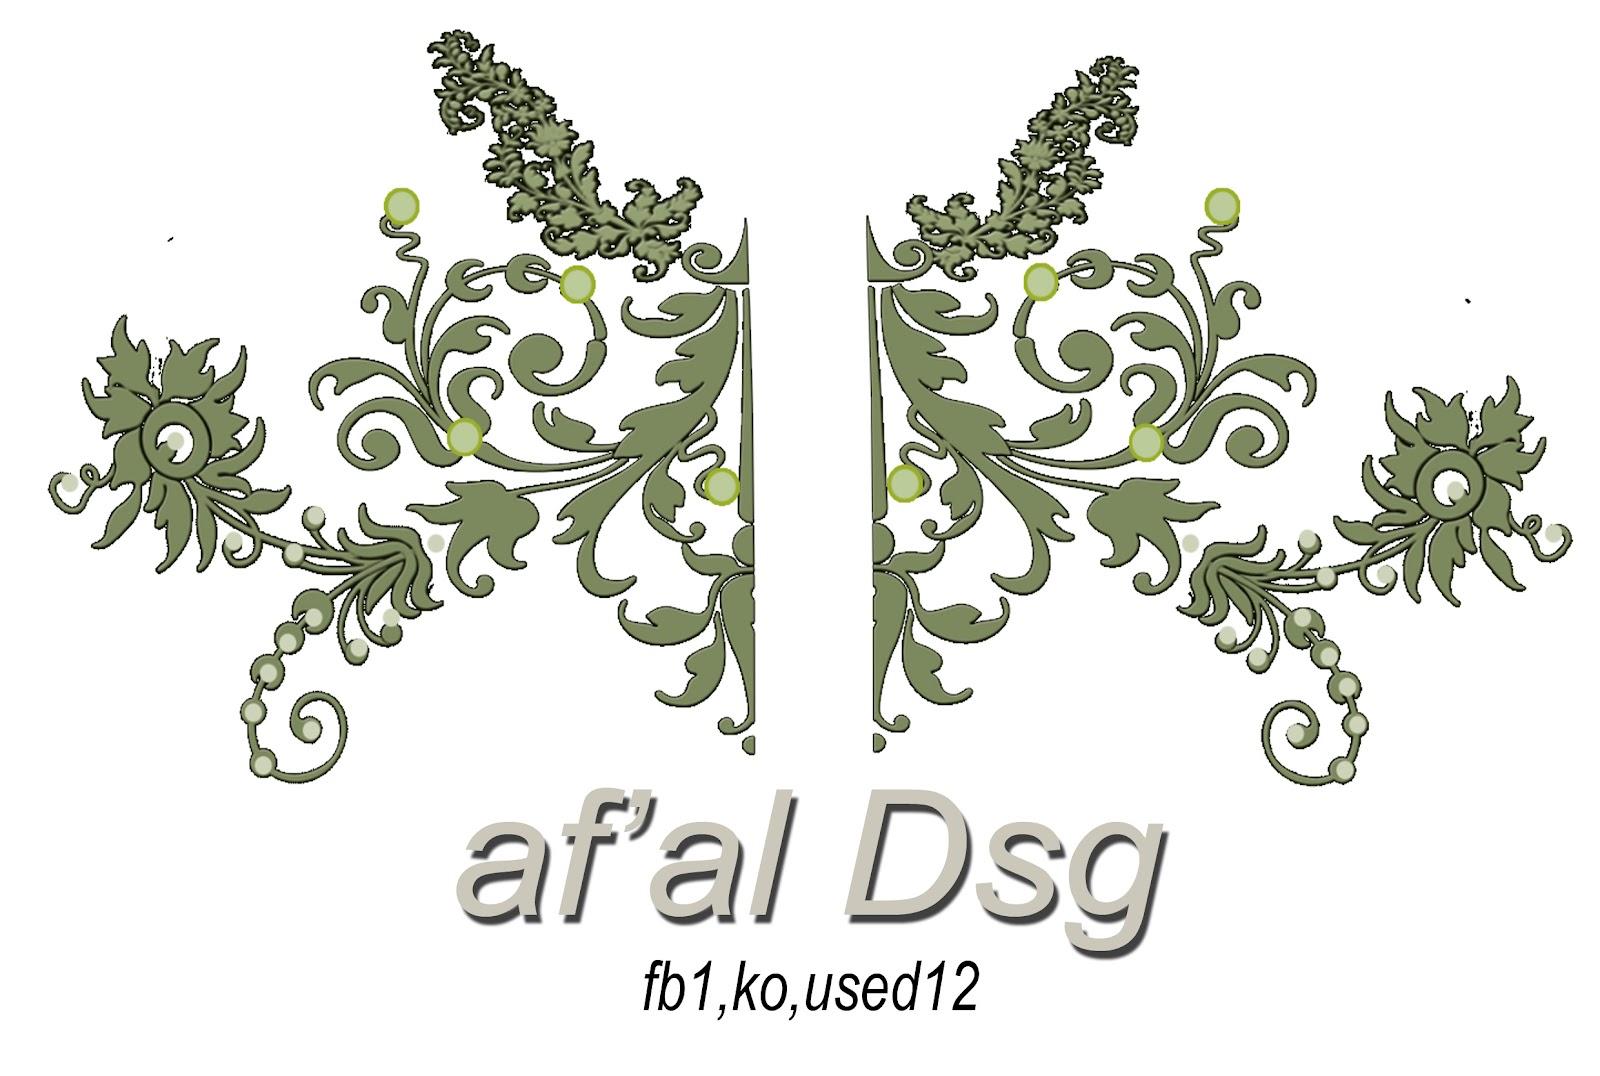 Contoh Design Motif Bordir Ornament Decoratif 2 | Tasikmalaya Bordir